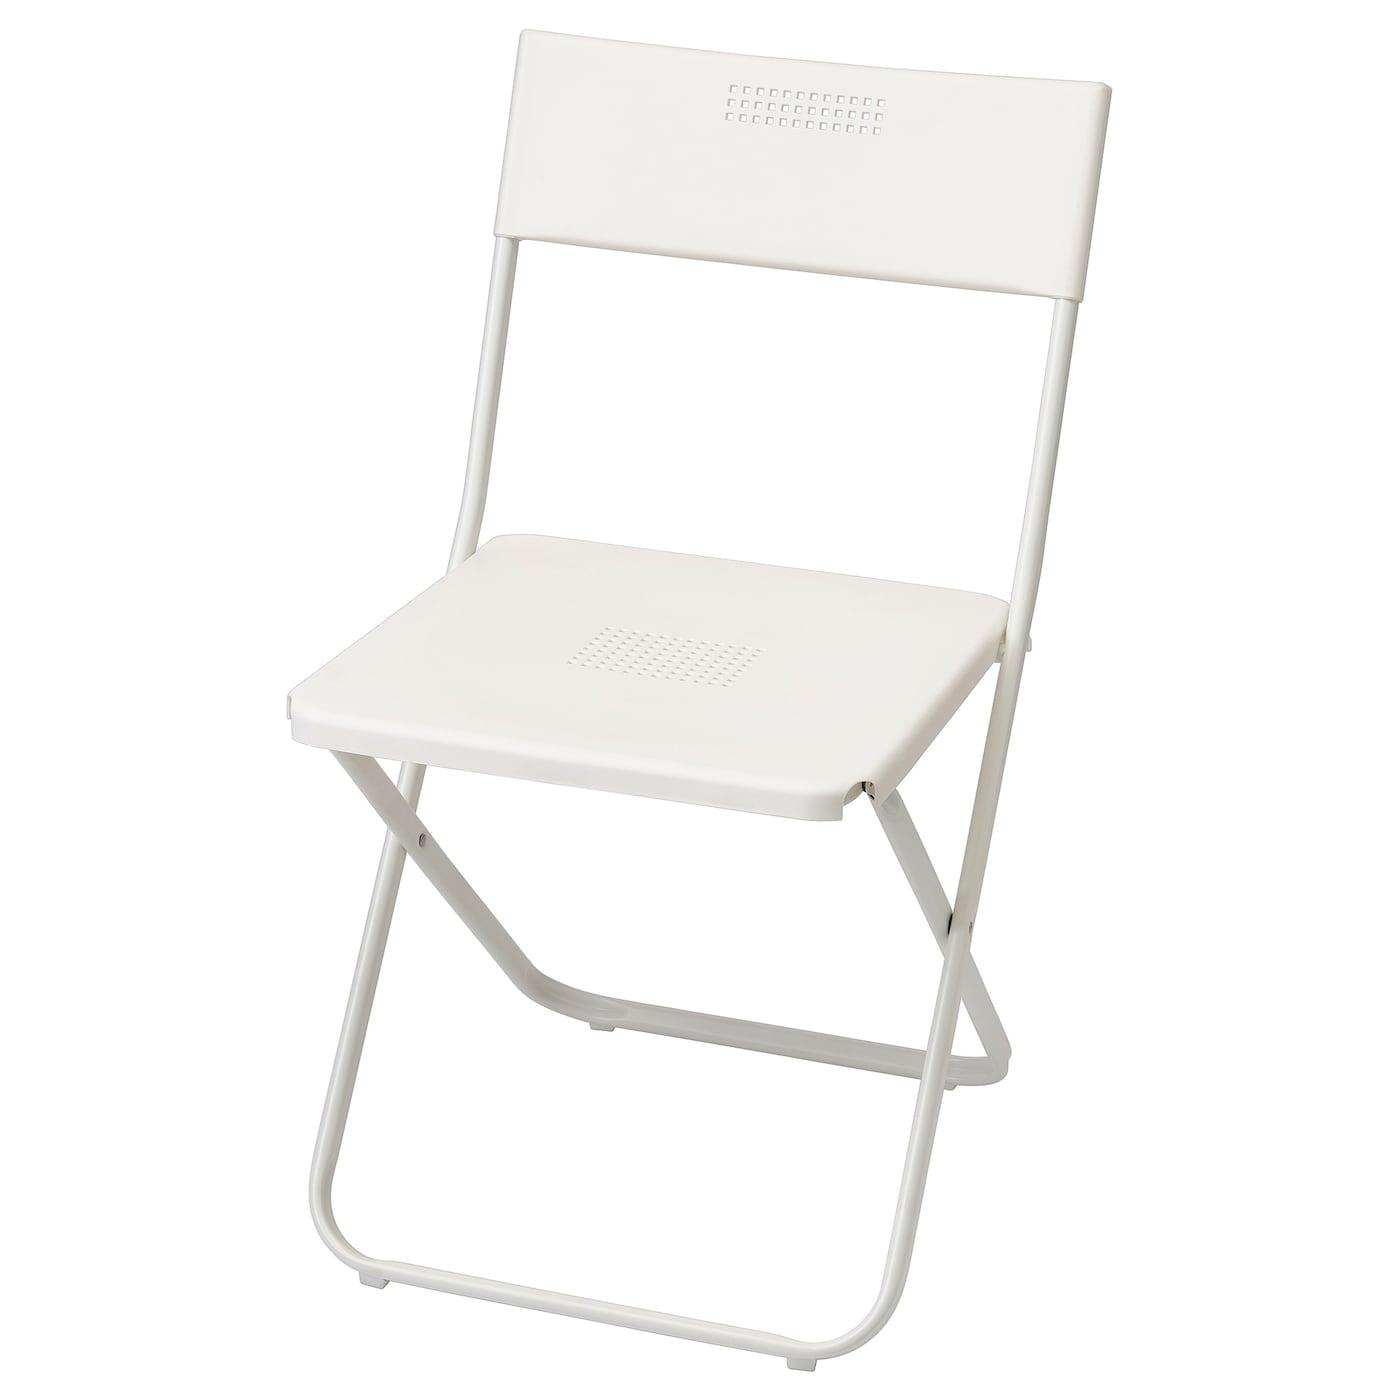 Fejan Chair Outdoor White Foldable